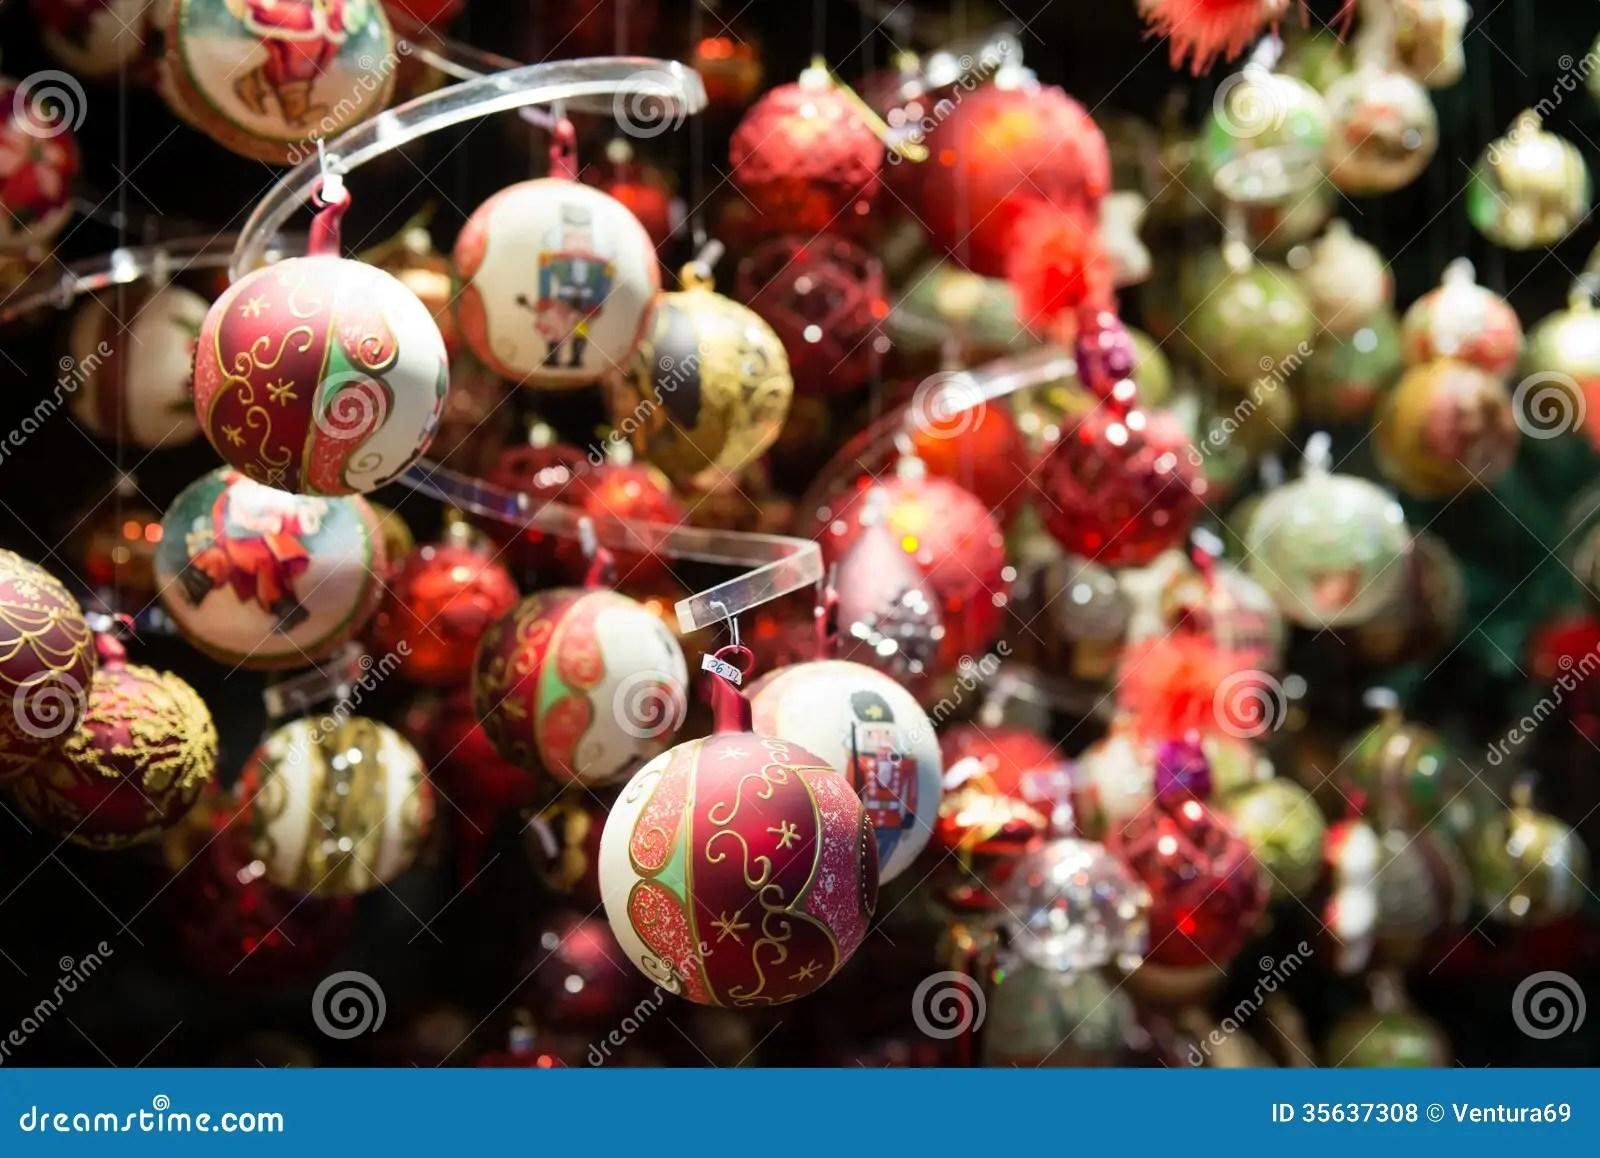 royalty free stock photo christmas market decoration